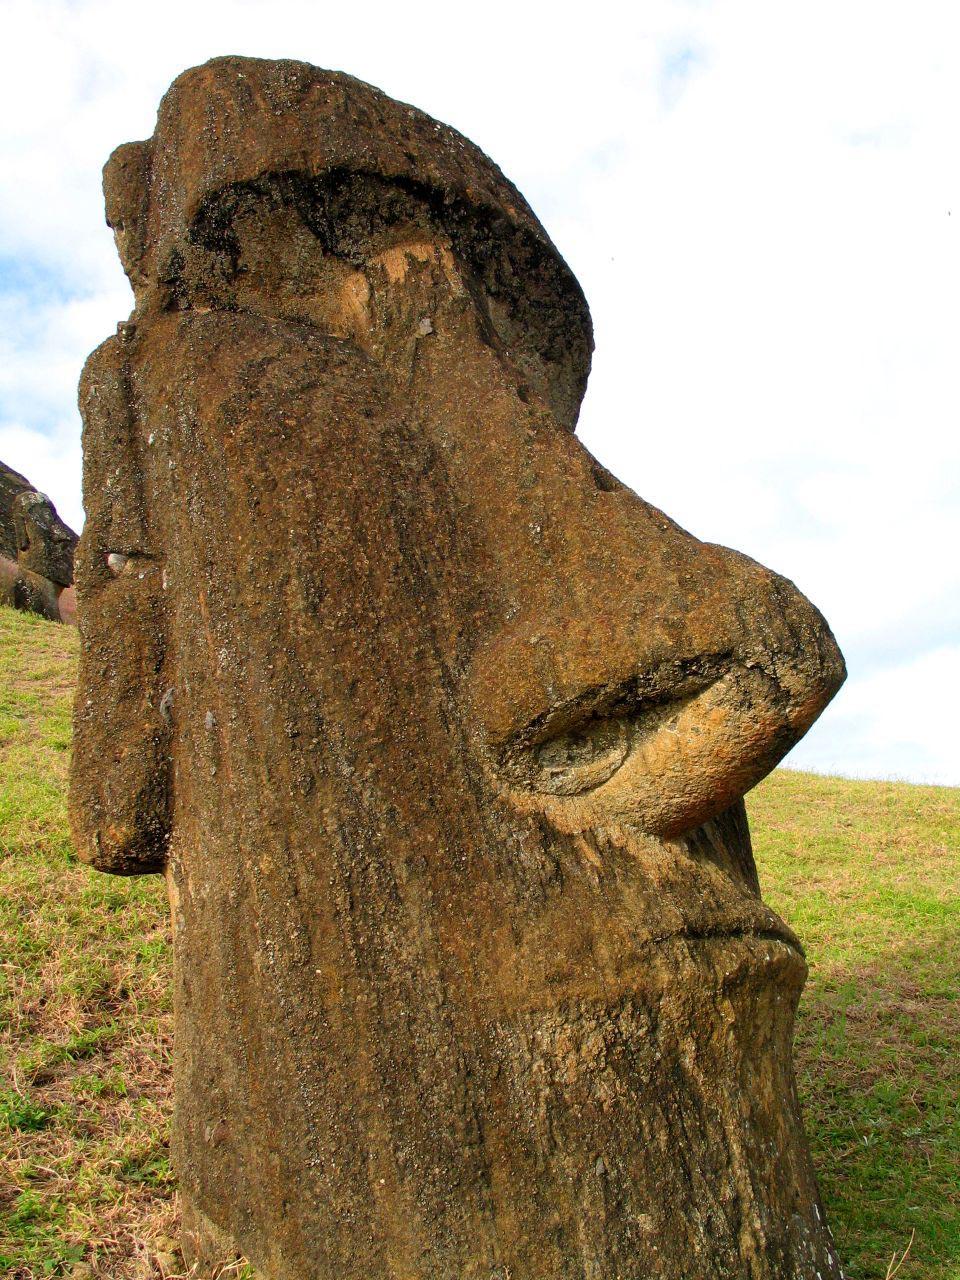 rapa nui7 Gigantic Moai Statues and Heads in Polynesian Easter Island